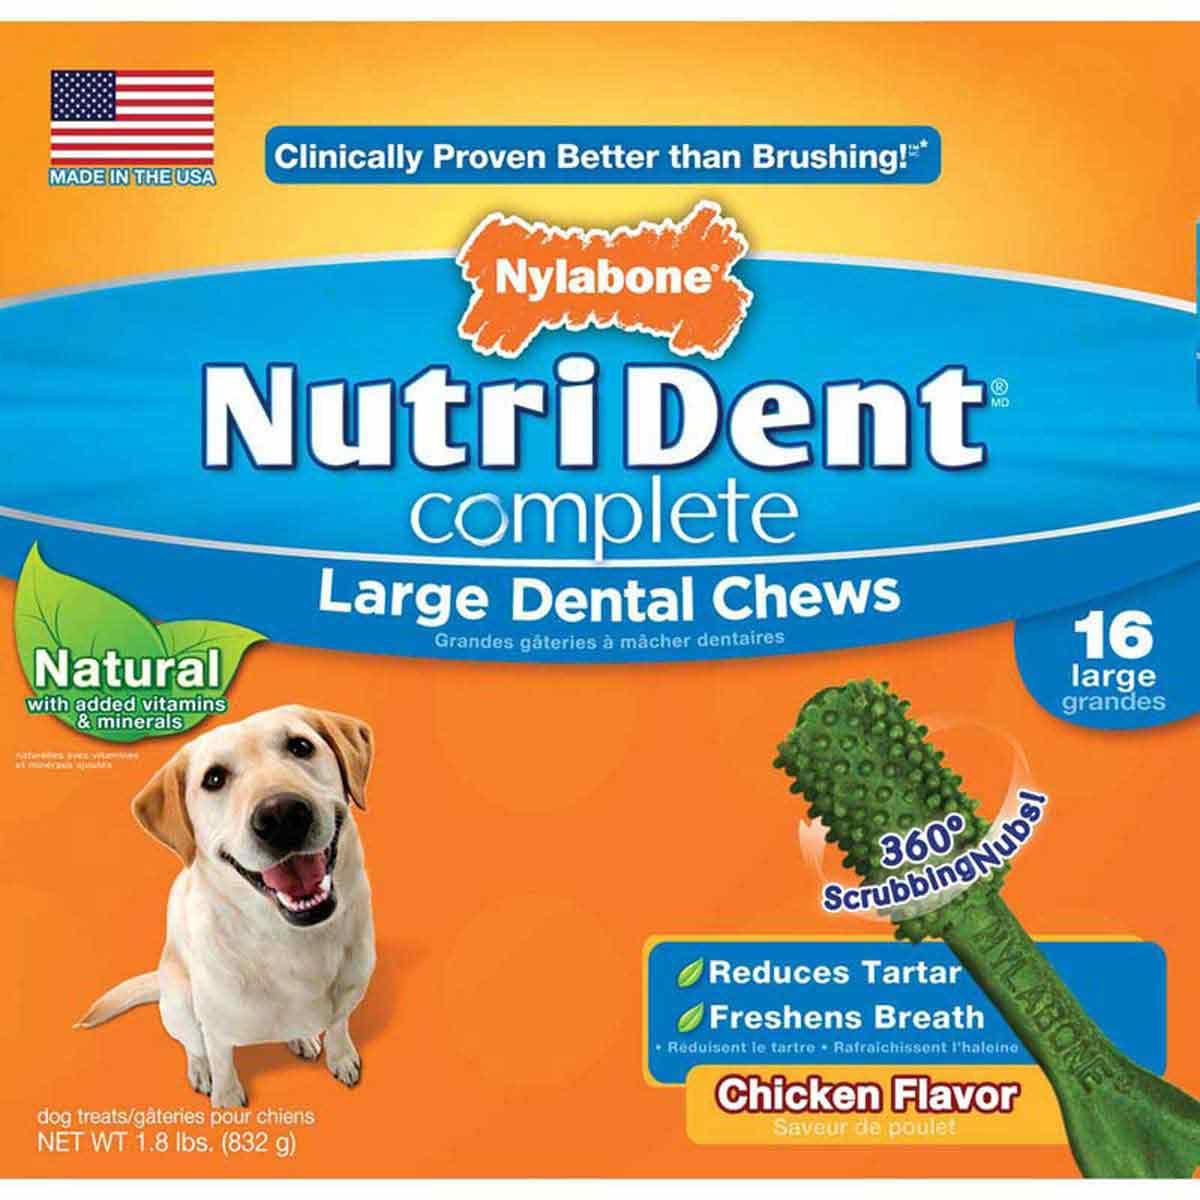 Nylabone Nutri Dent Complete Adult Chicken Flavored Large Dental Chews 16 Count